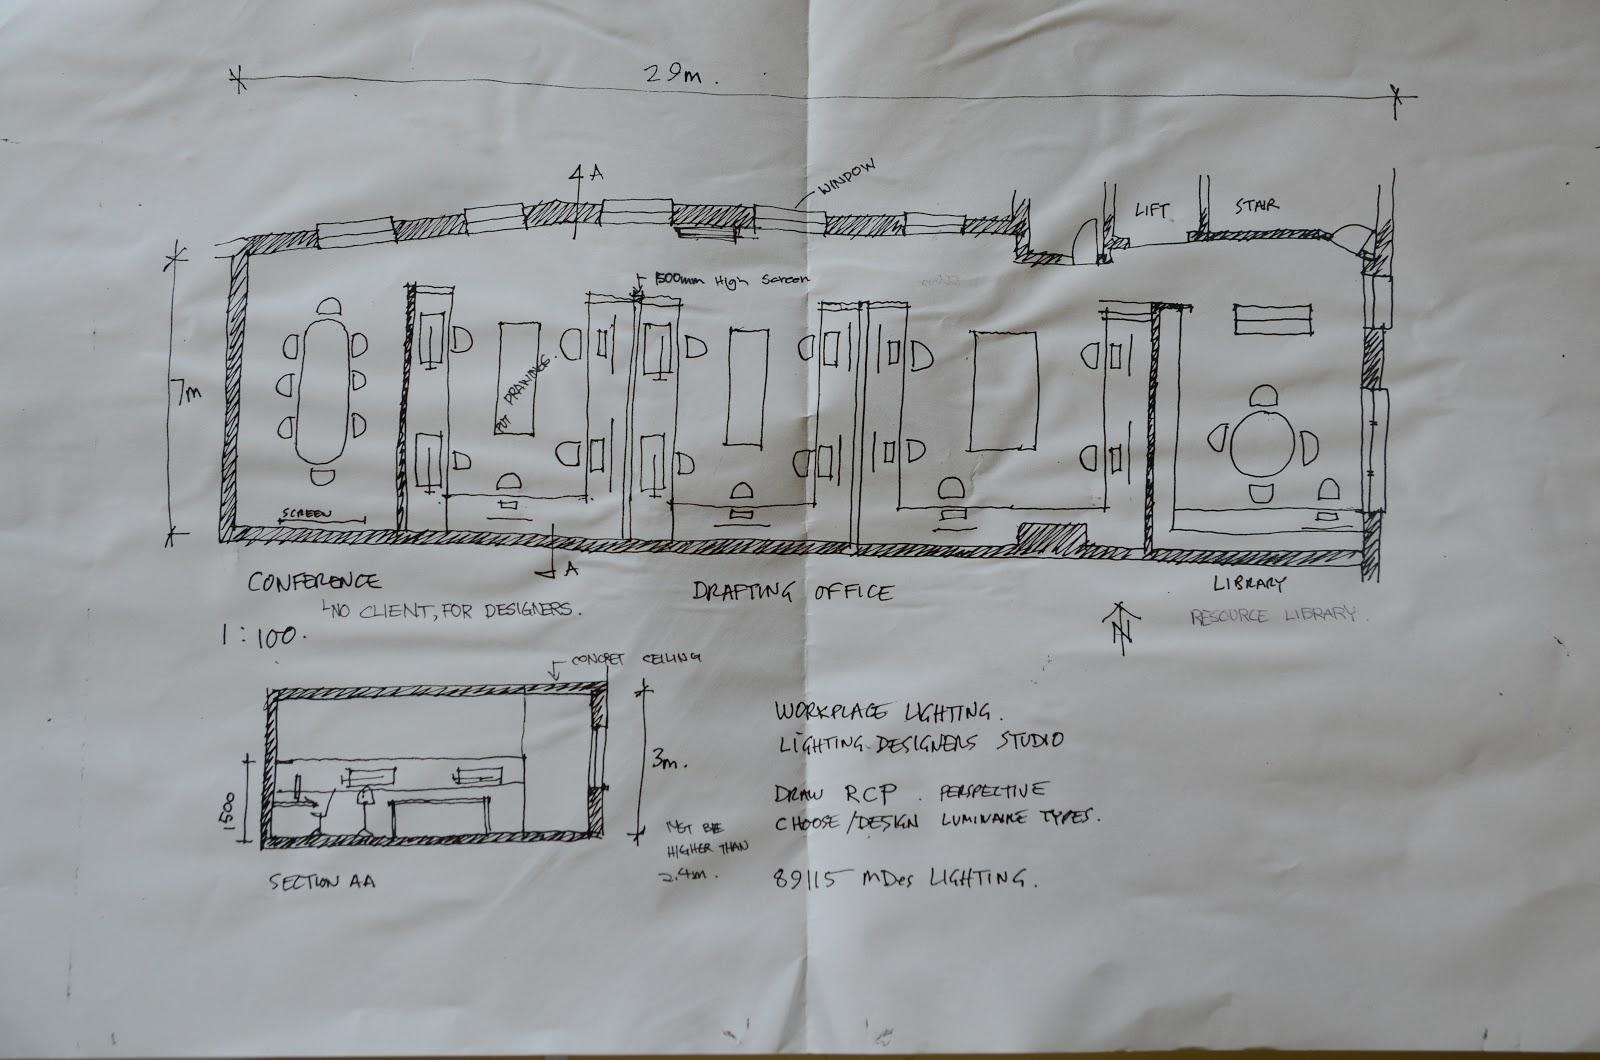 Lighting Studio / Lecture 2 | UTS Master of Design, Lighting Studio